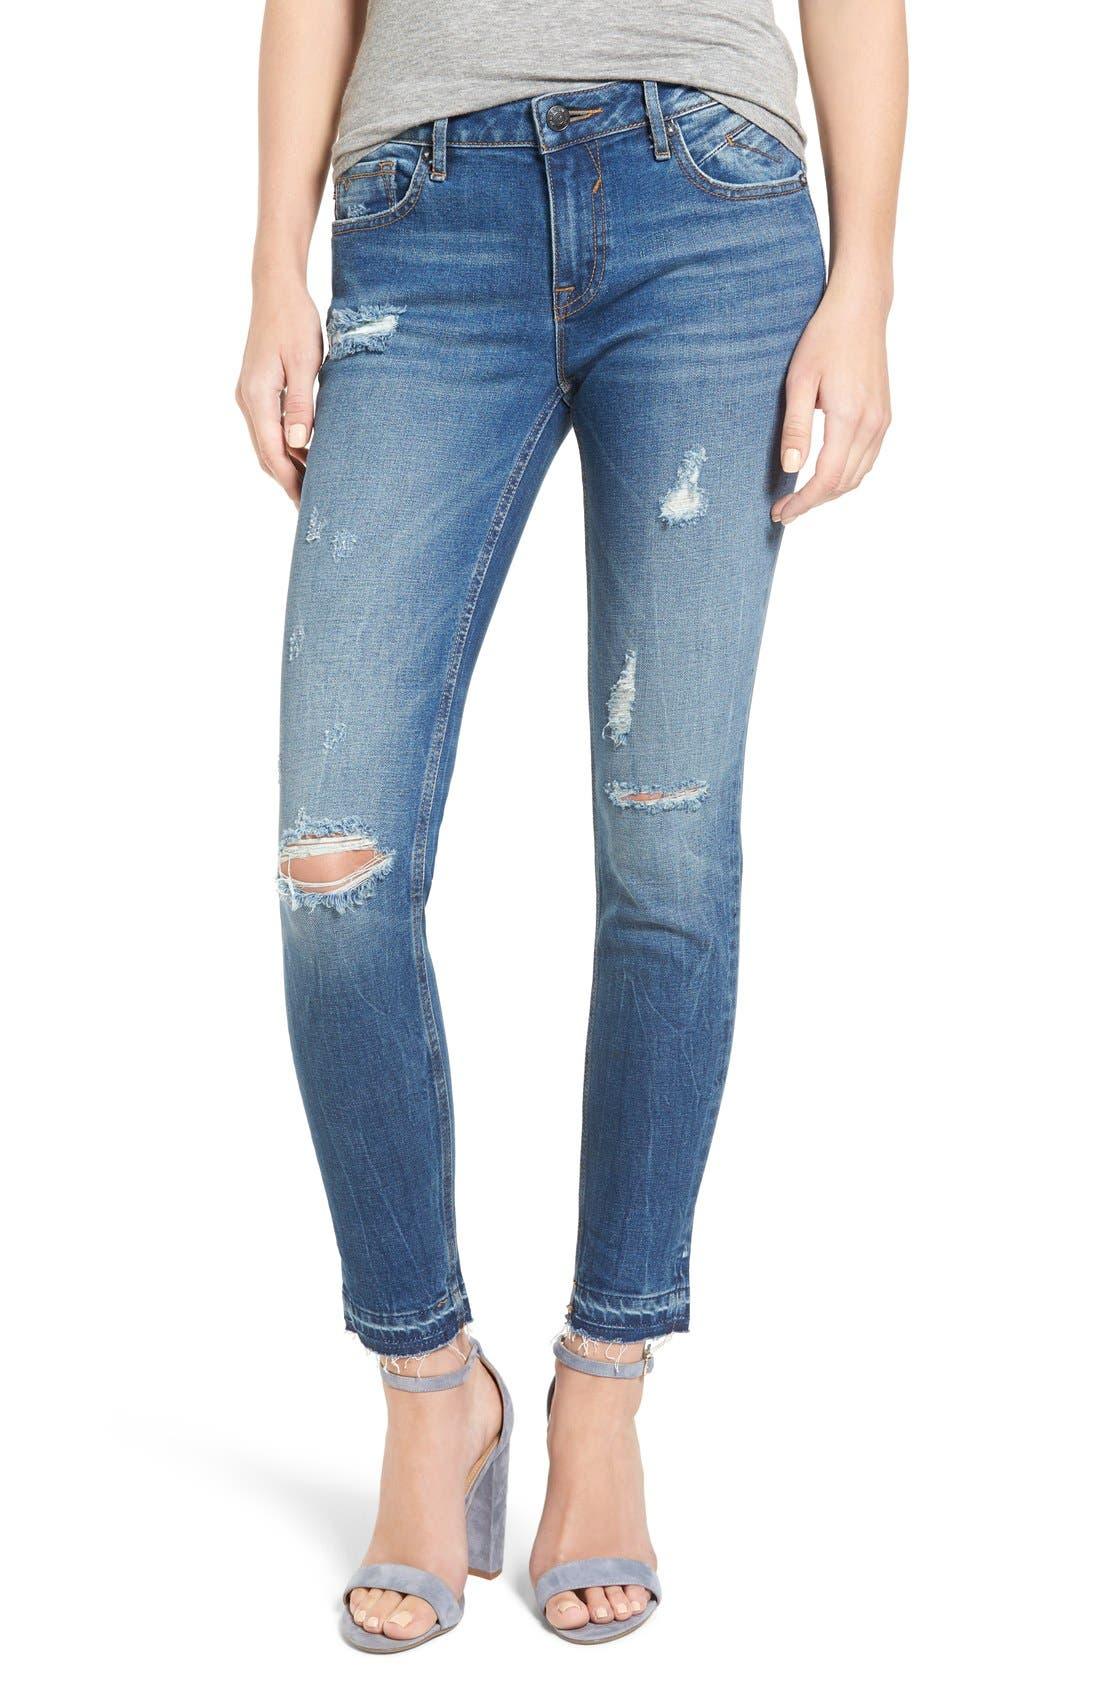 Alternate Image 1 Selected - Vigoss 'Chelsea' Distressed Raw Hem Skinny Jeans